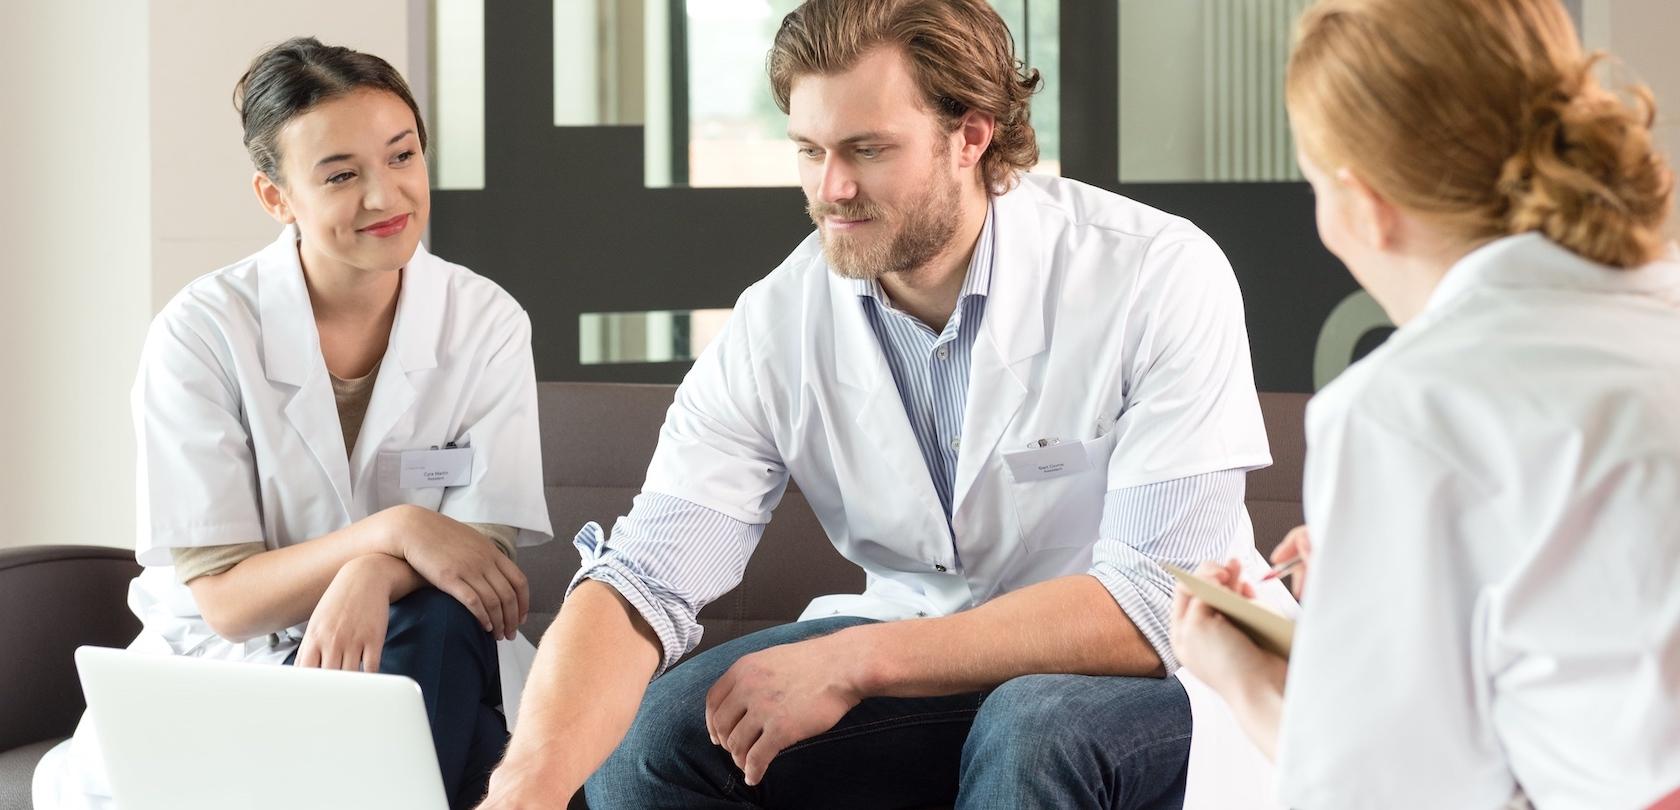 VB Sparen en beleggen spaarbuffer jonge artsen in overleg-2